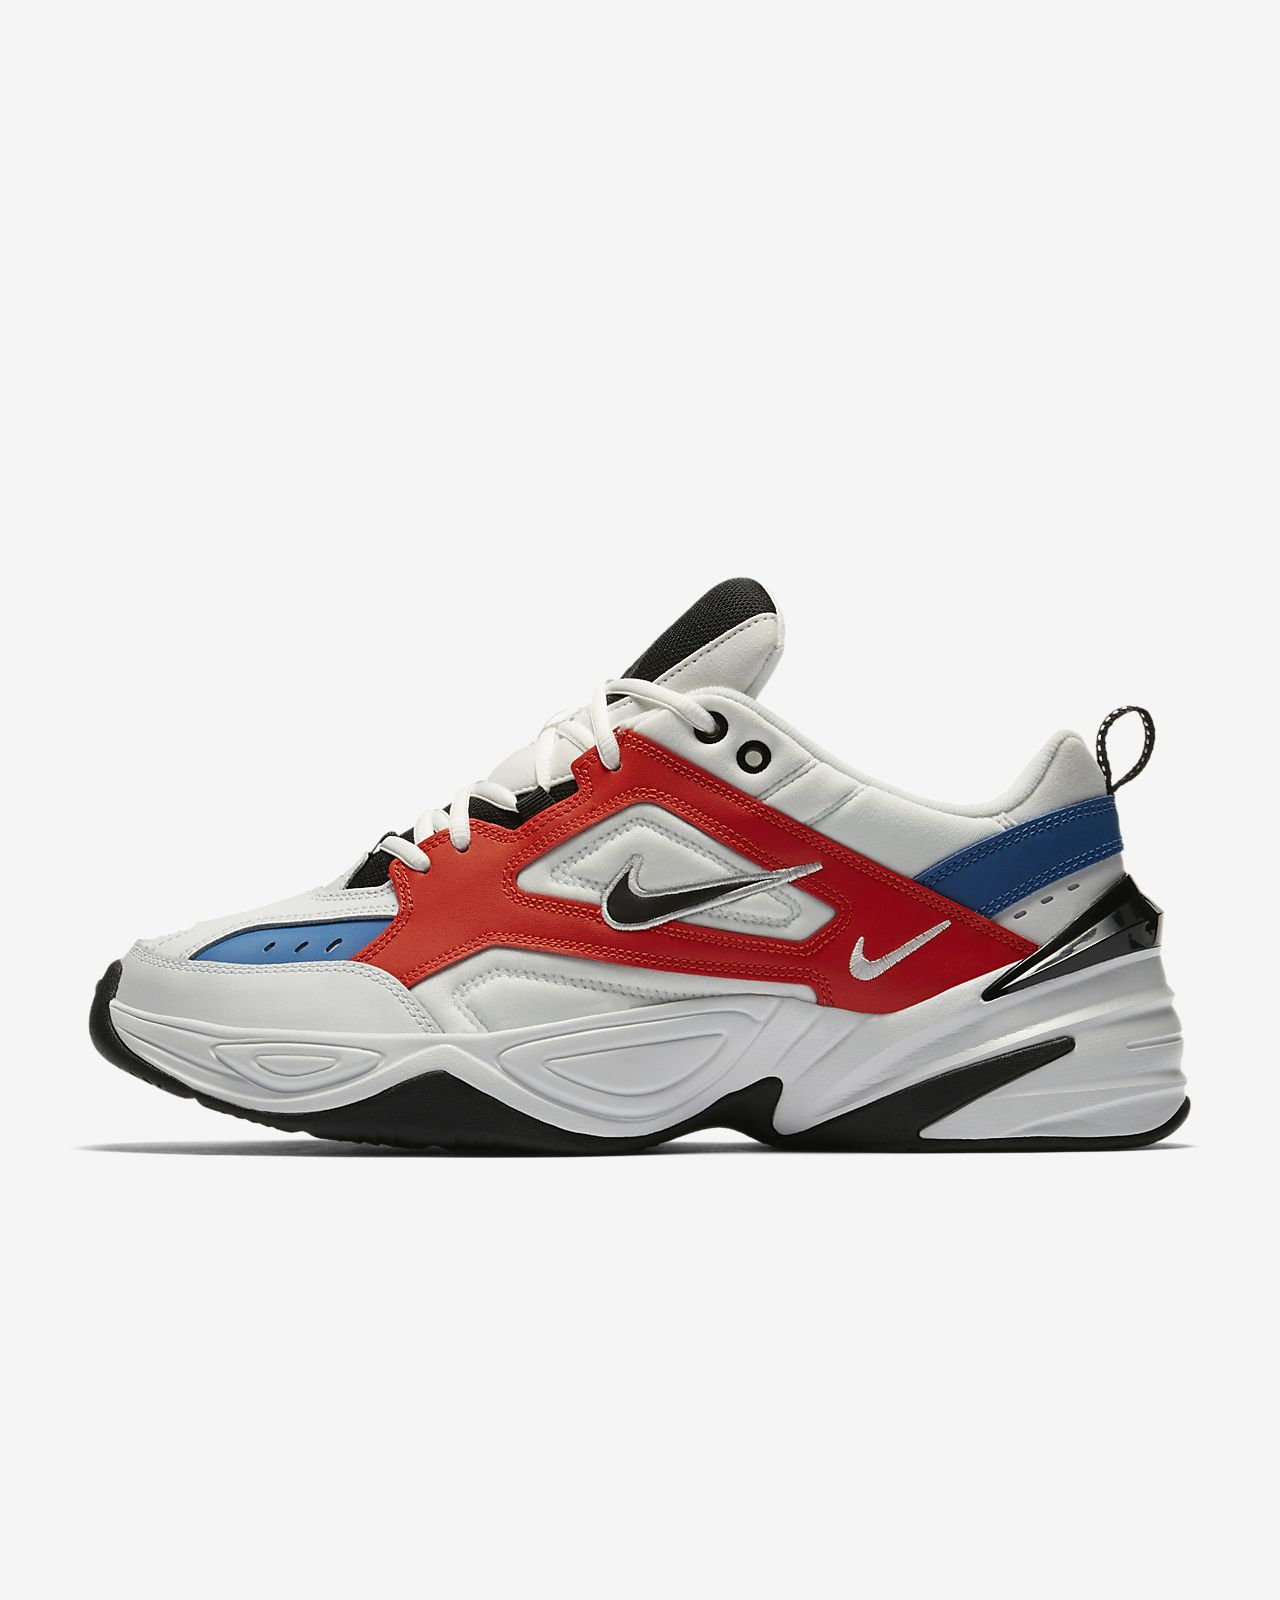 footwear new authentic on wholesale Nike M2K Tekno Men's Shoe